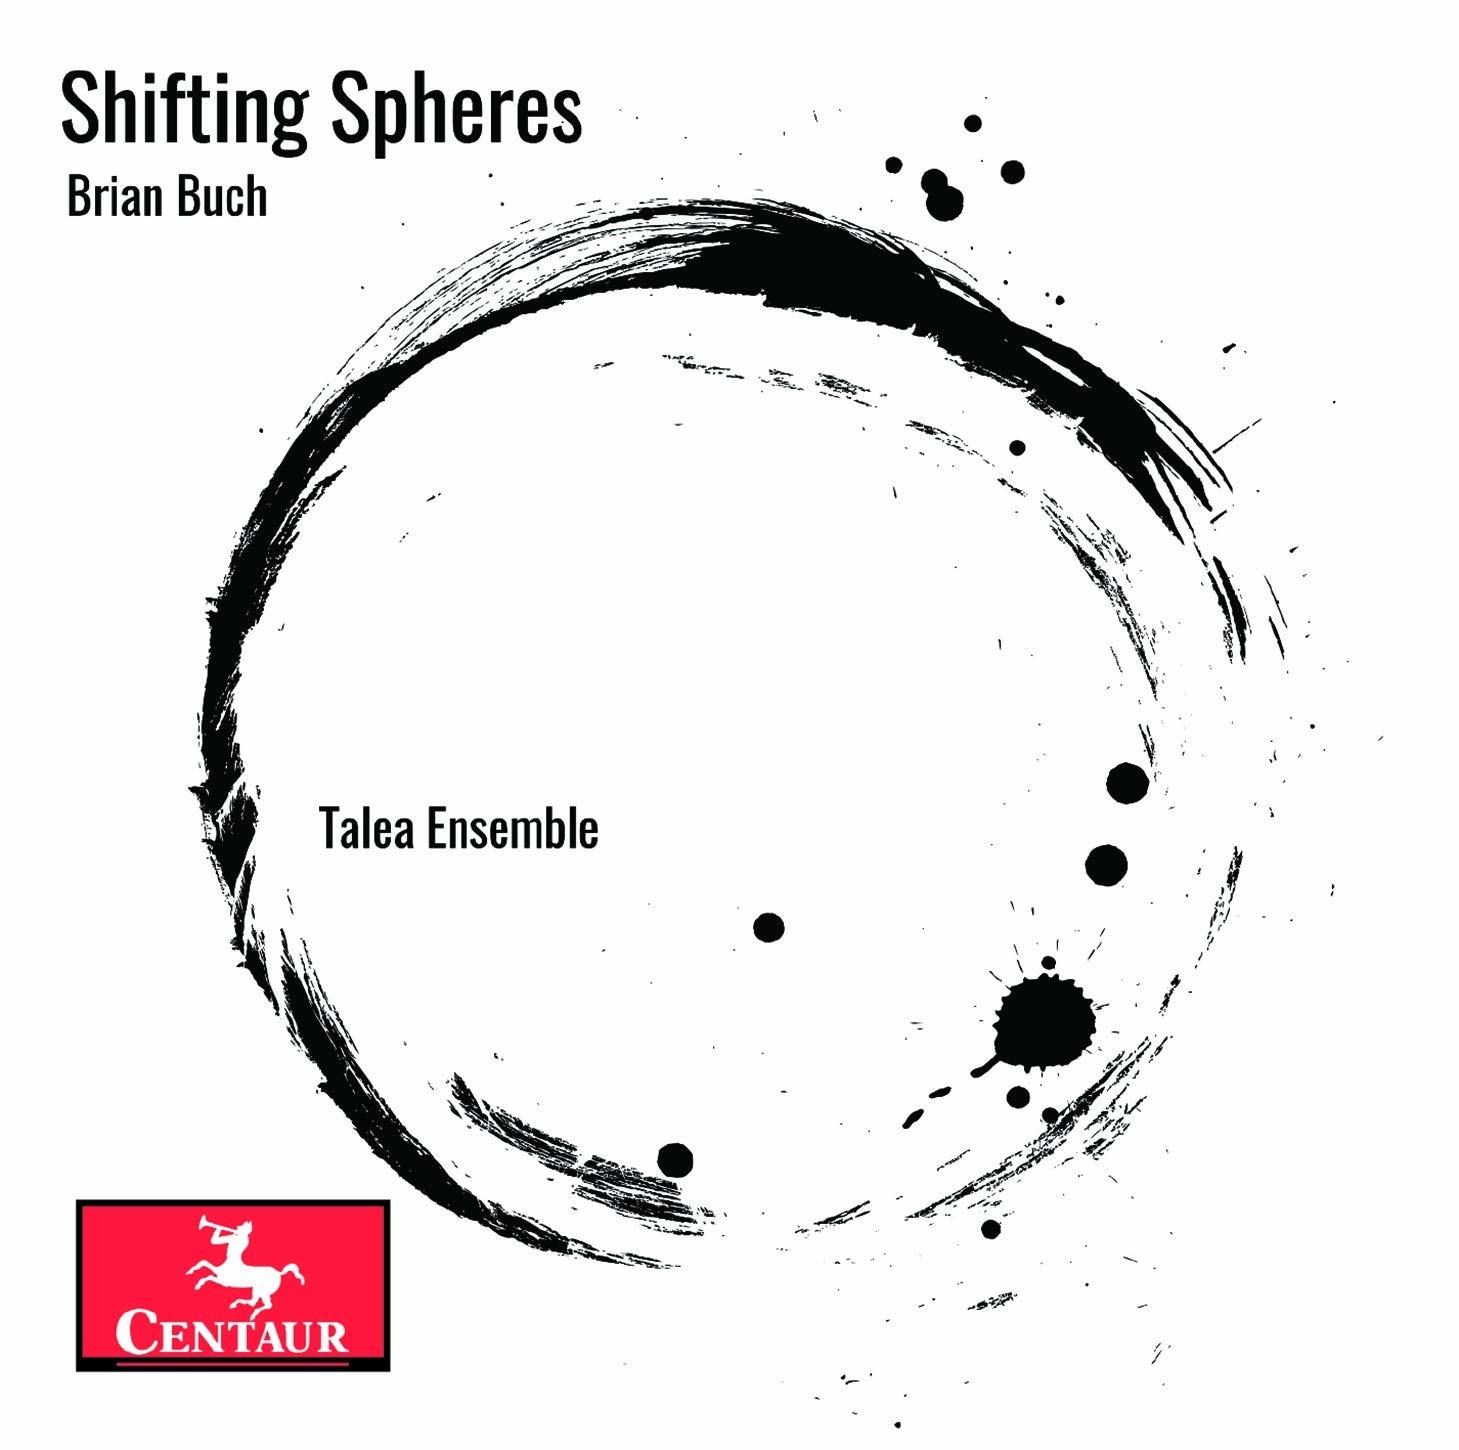 Shifting Spheres - Buch / Talea Ensemble - Musik -  - 0044747383125 - October 2, 2020